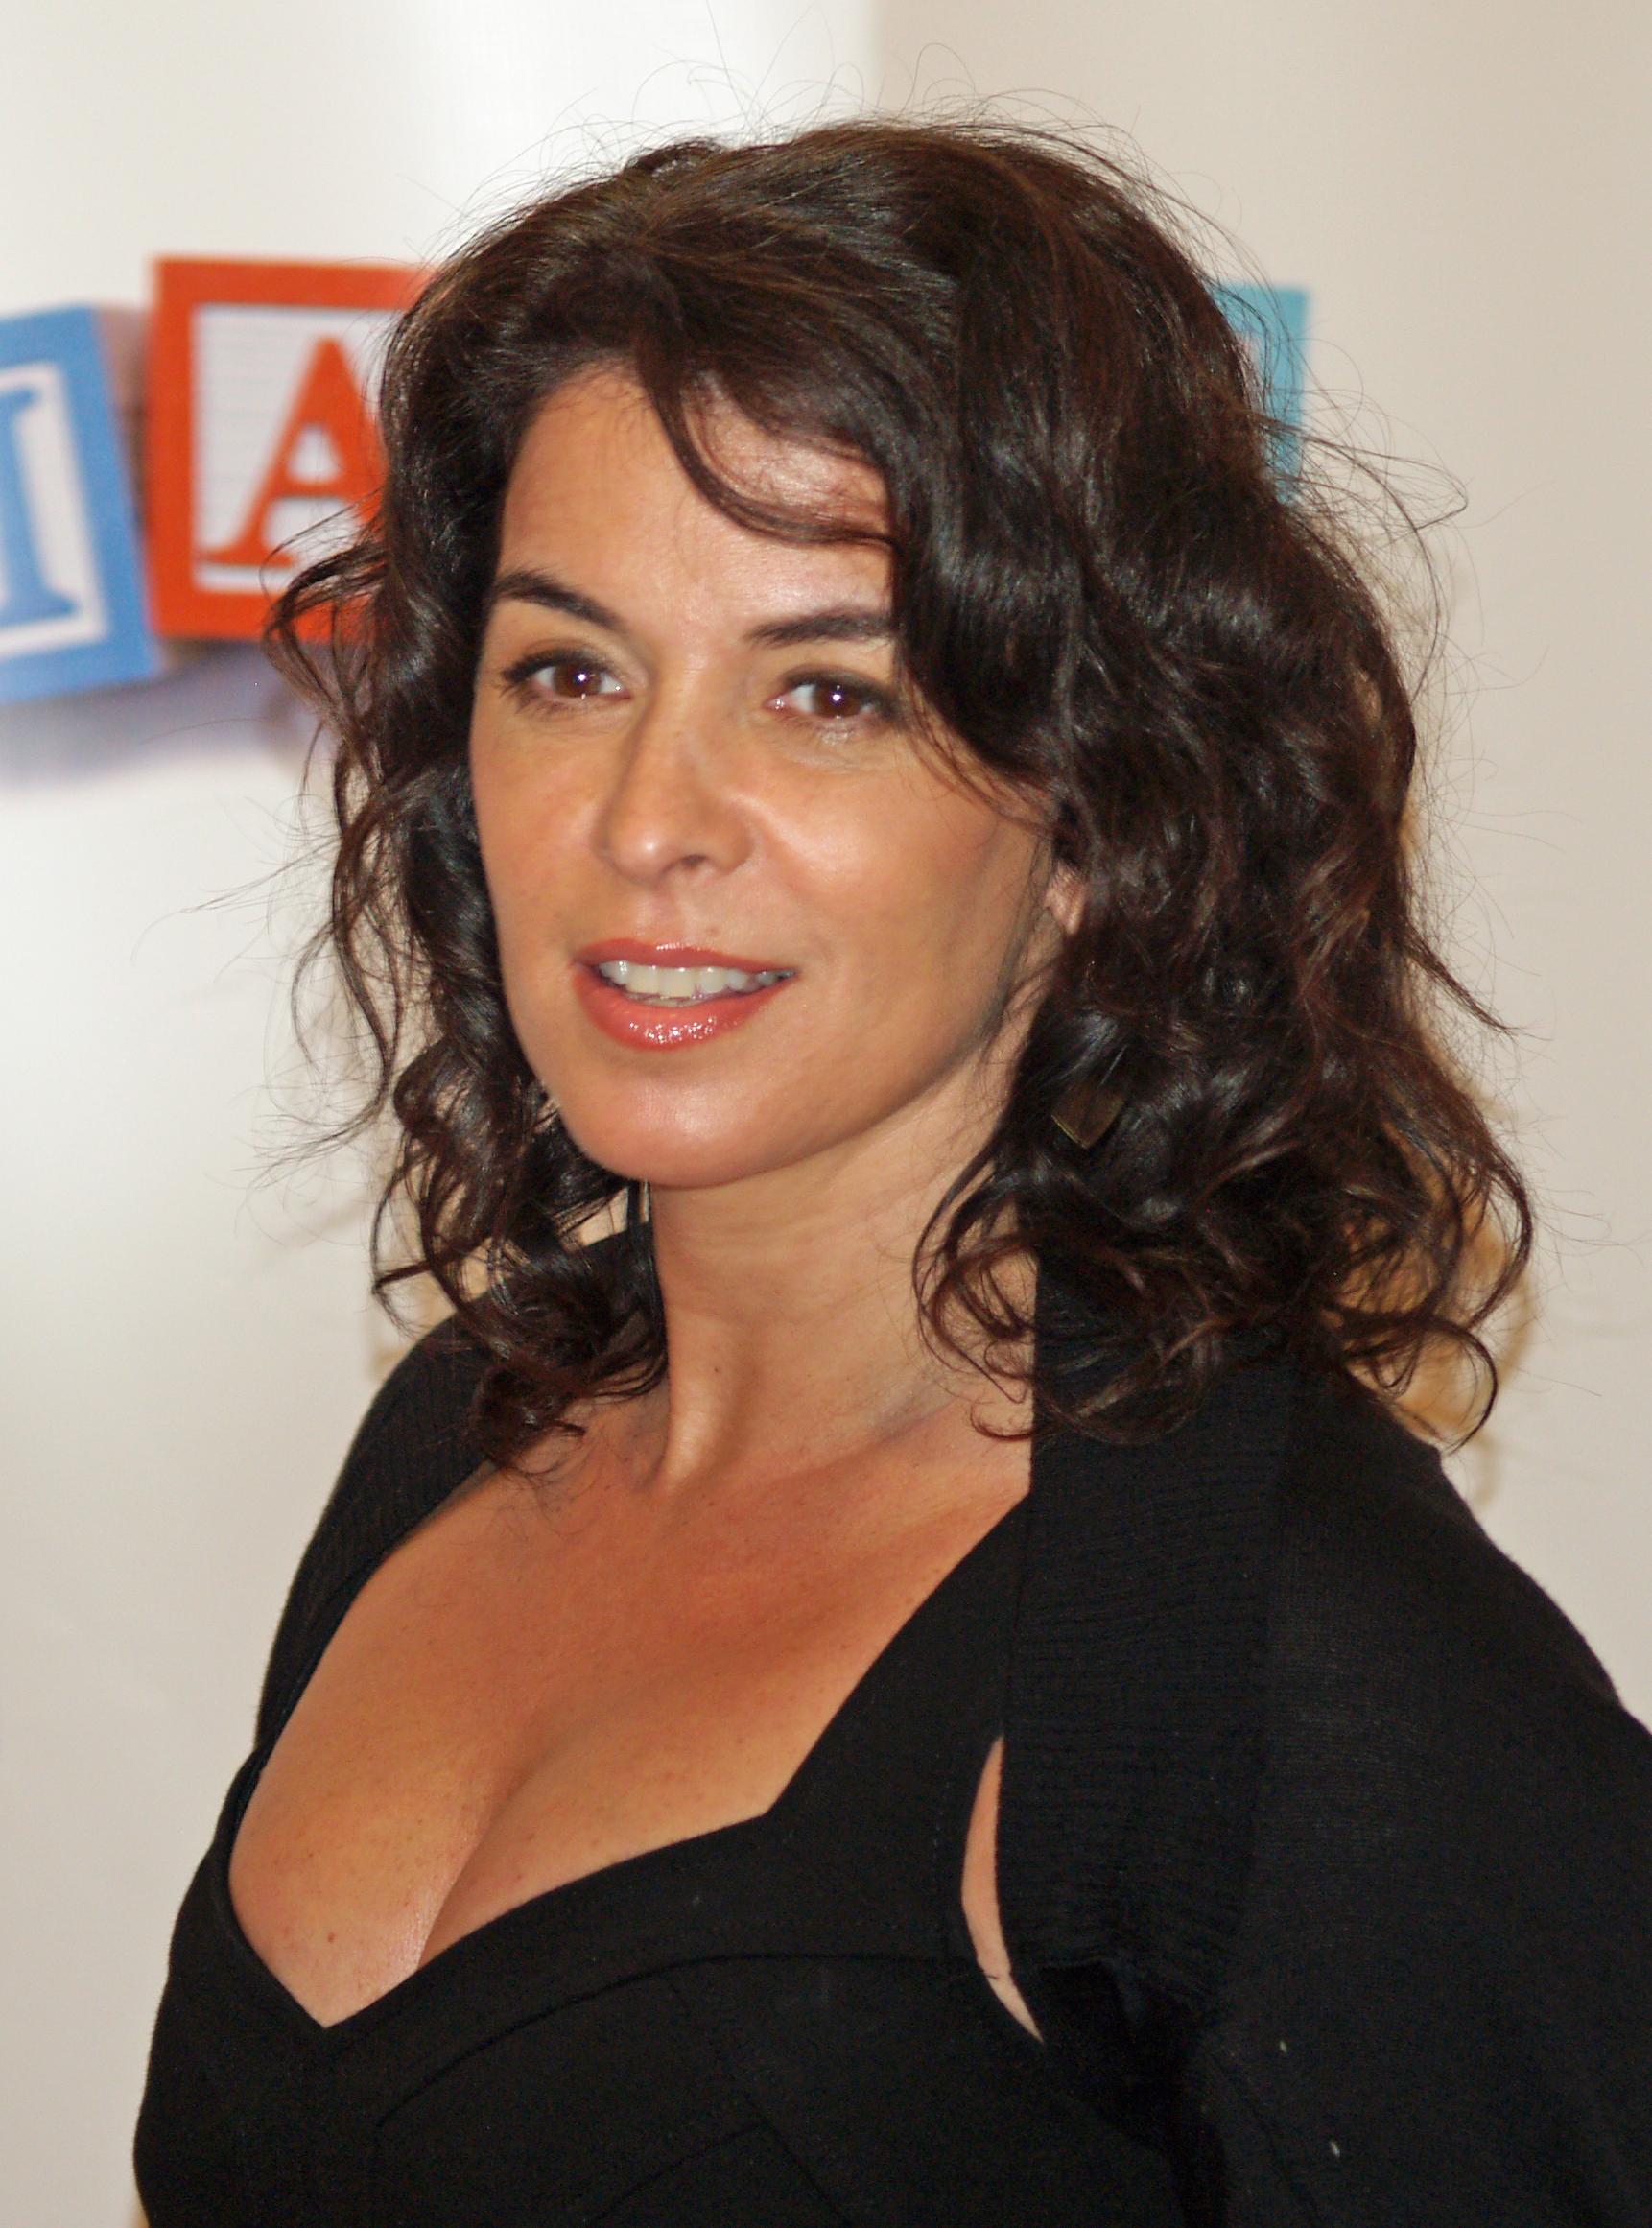 Annabella1985